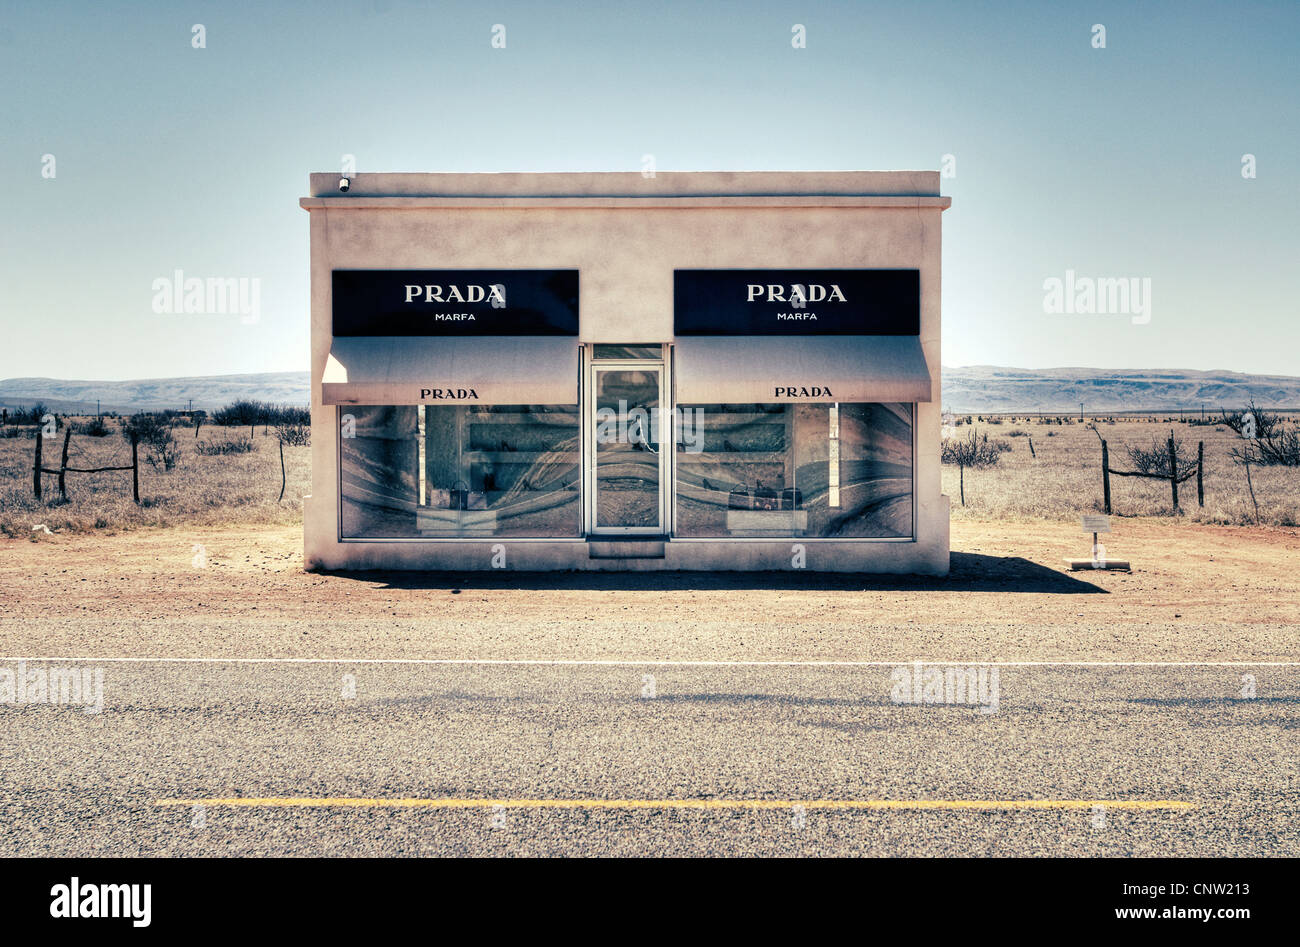 The Prada Marfa Store In Valentine, TX